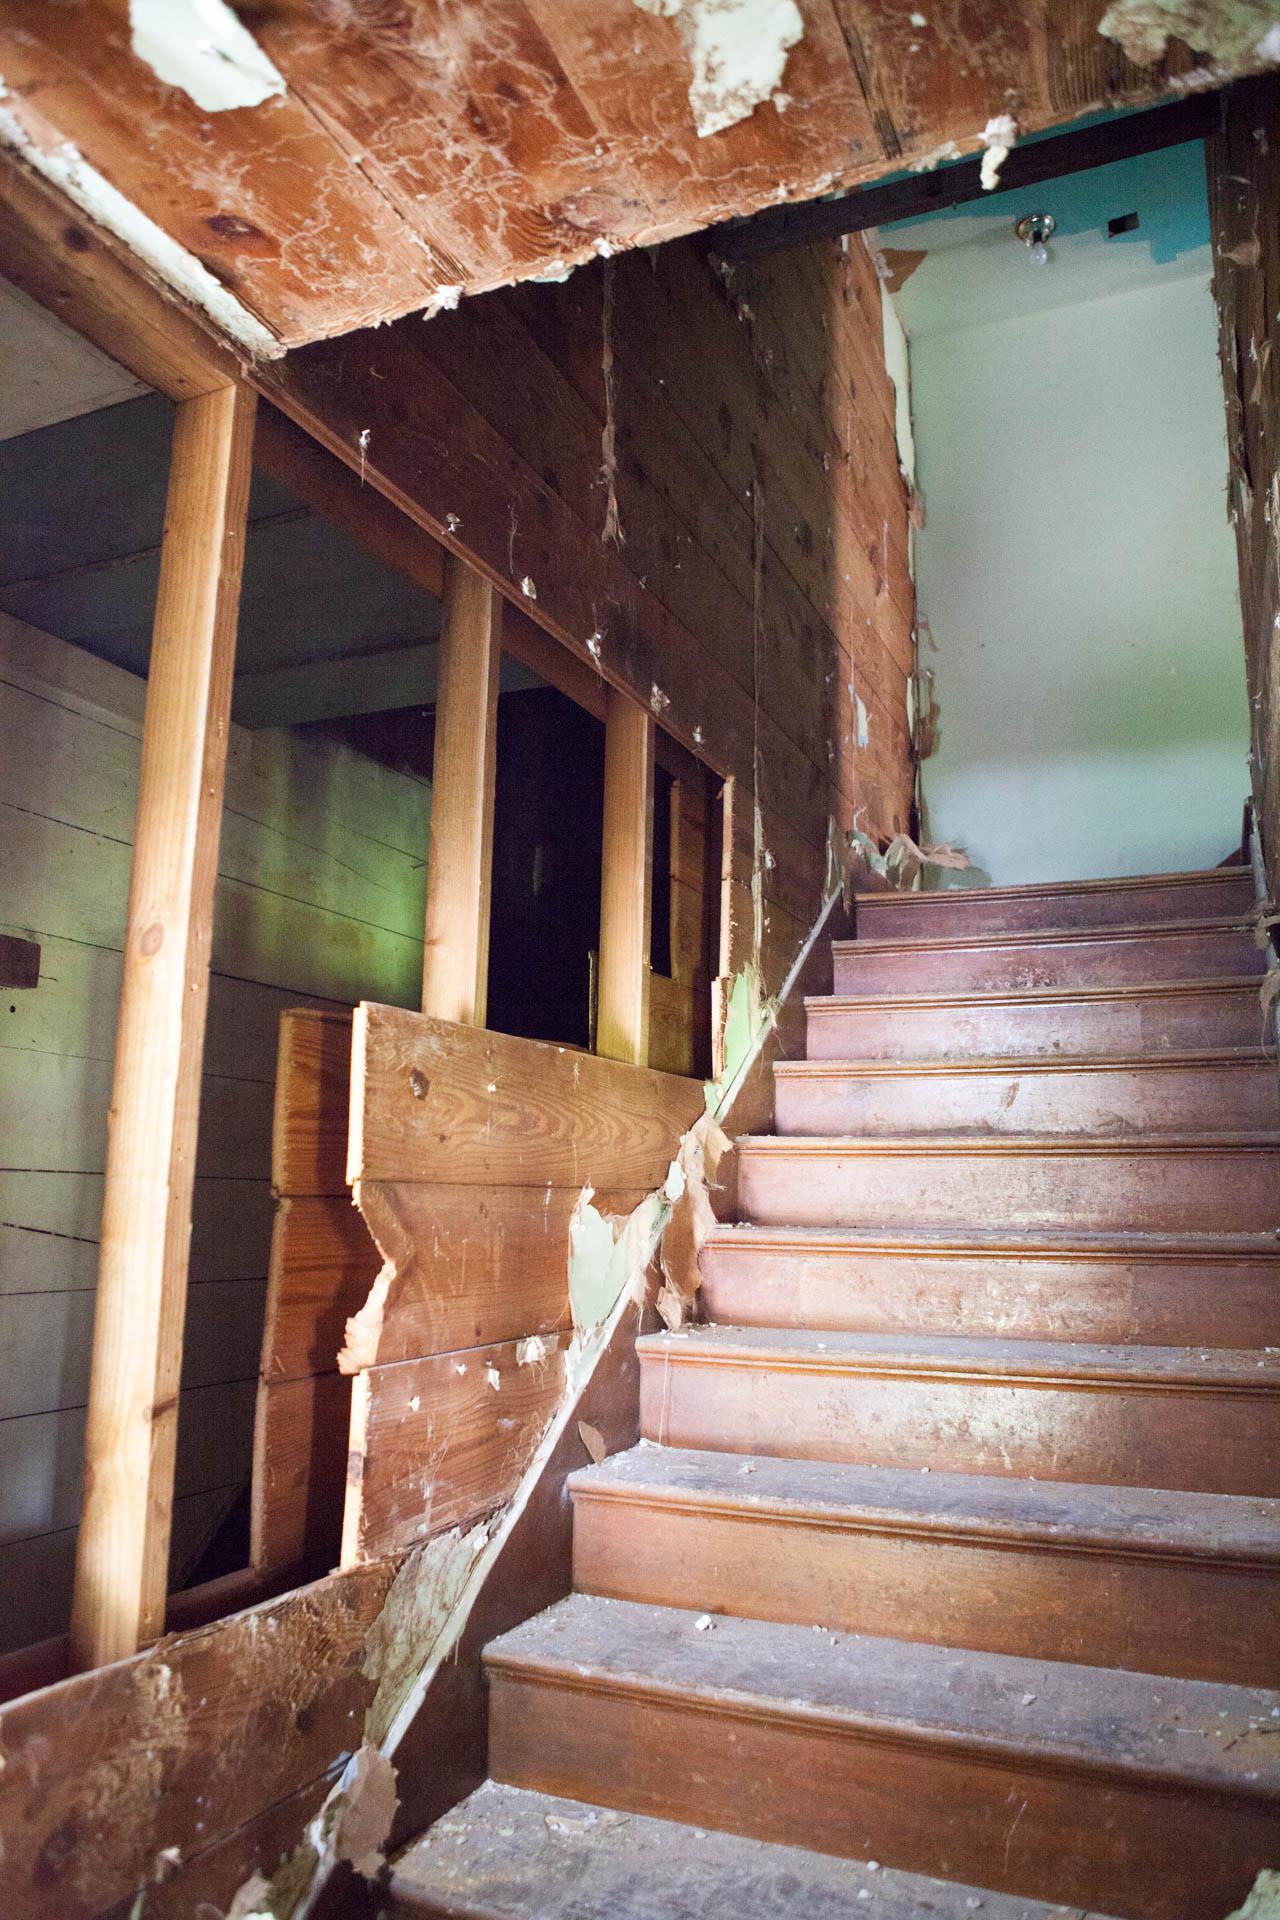 House-flipping-Houston-Treppenhaus-Haus-alt